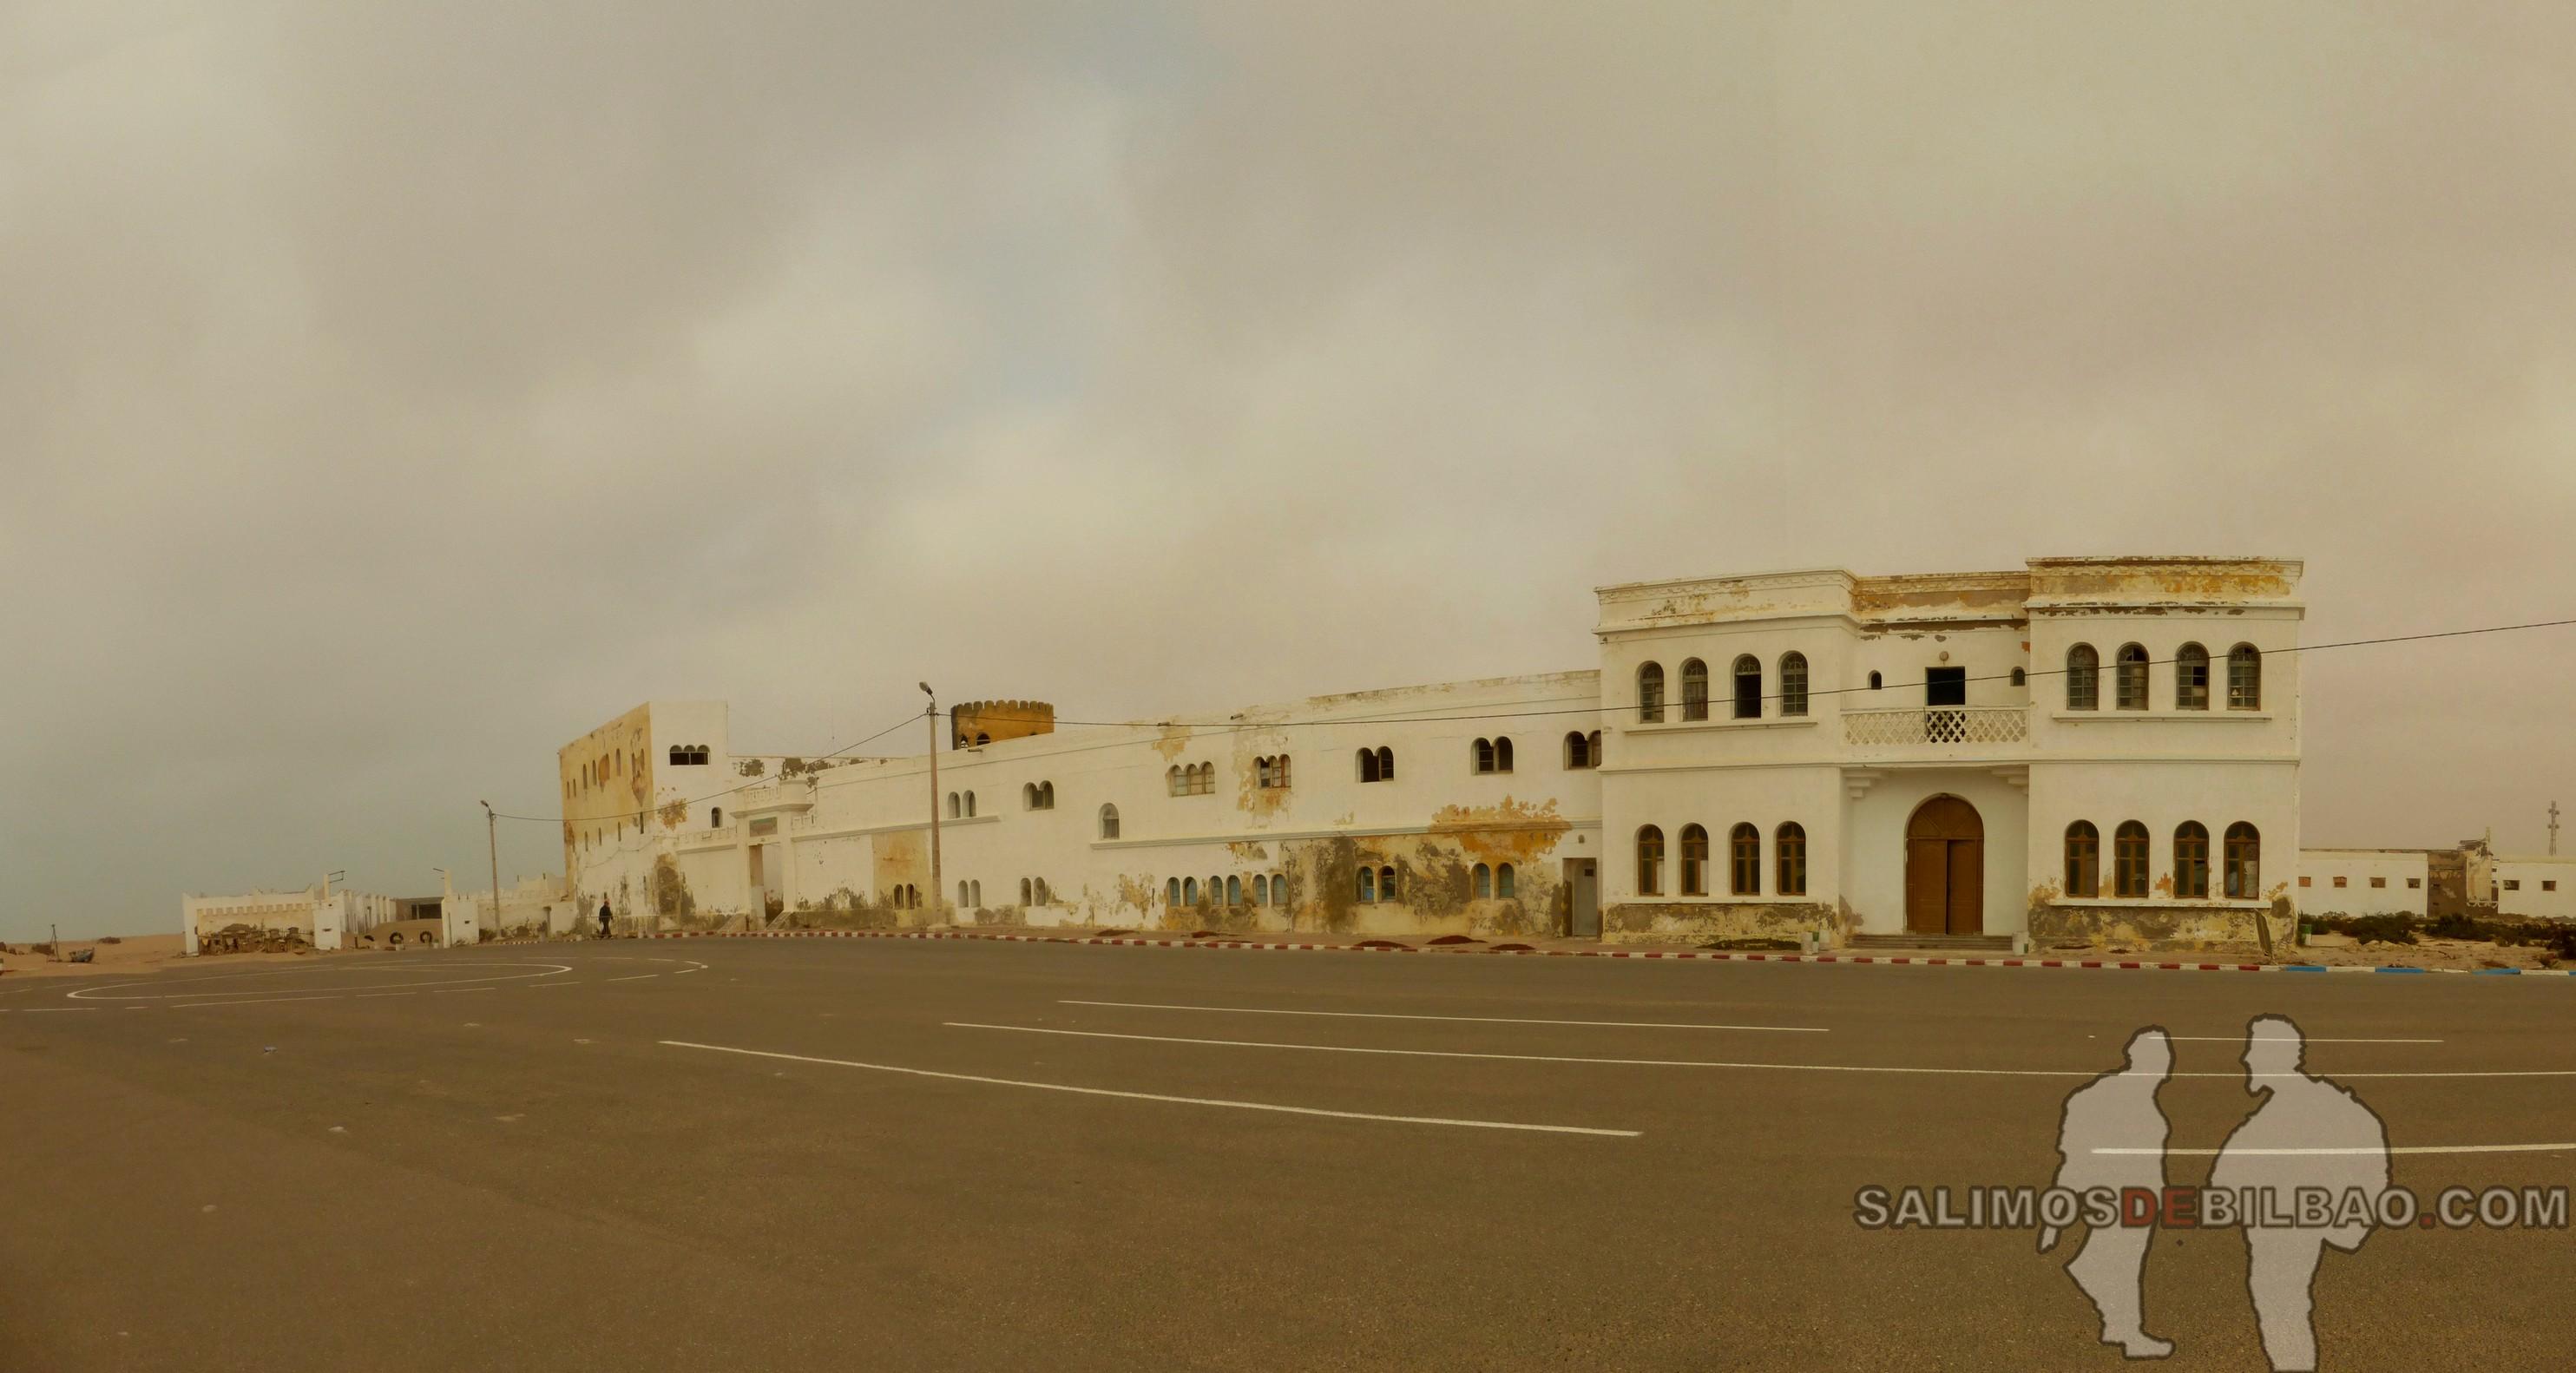 293. Pano, Edificio abandonado junto a la playa, Tarfaya